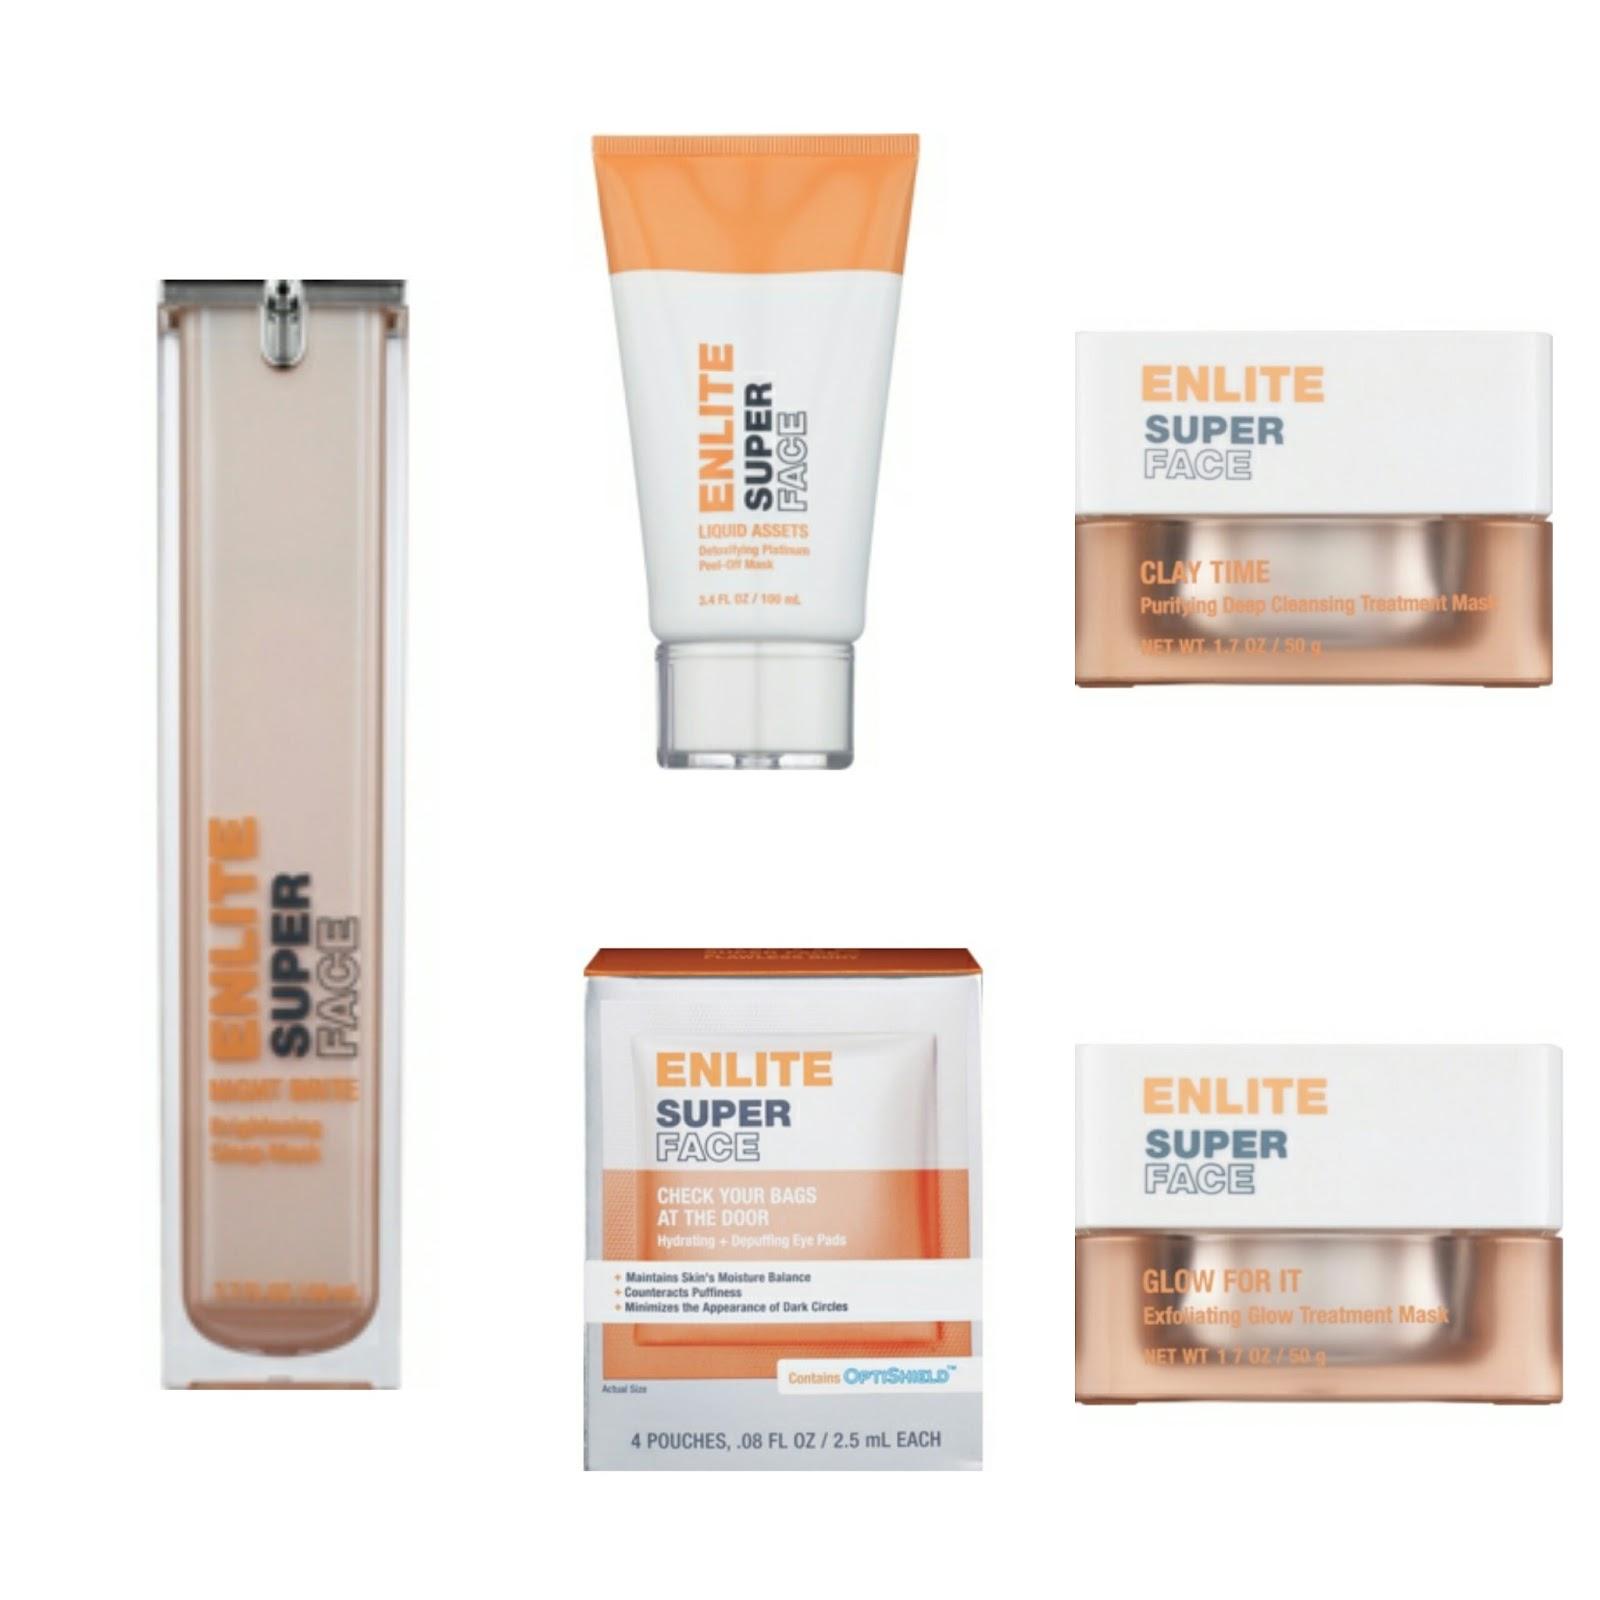 new enlite skincare line at cvs the budget beauty blog